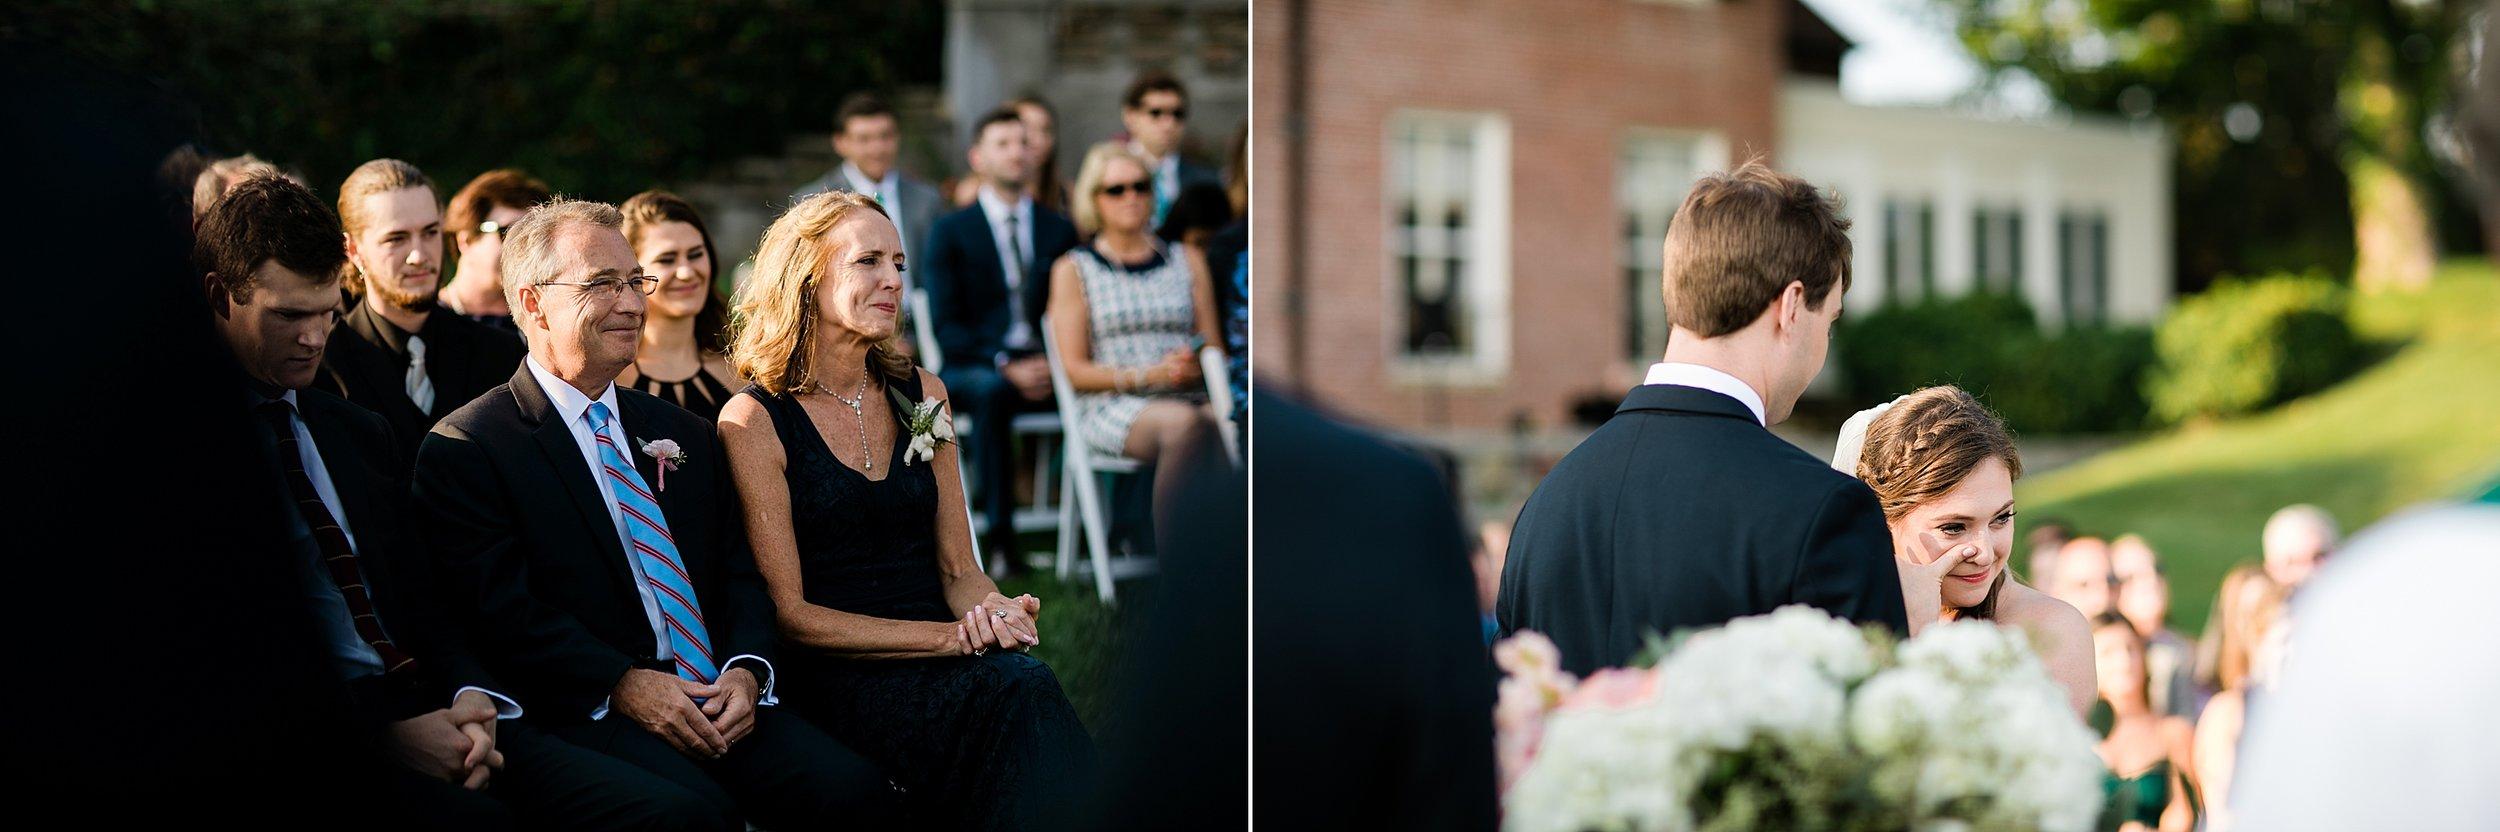 031 los angeles wedding photographer todd danforth photography boston.jpg